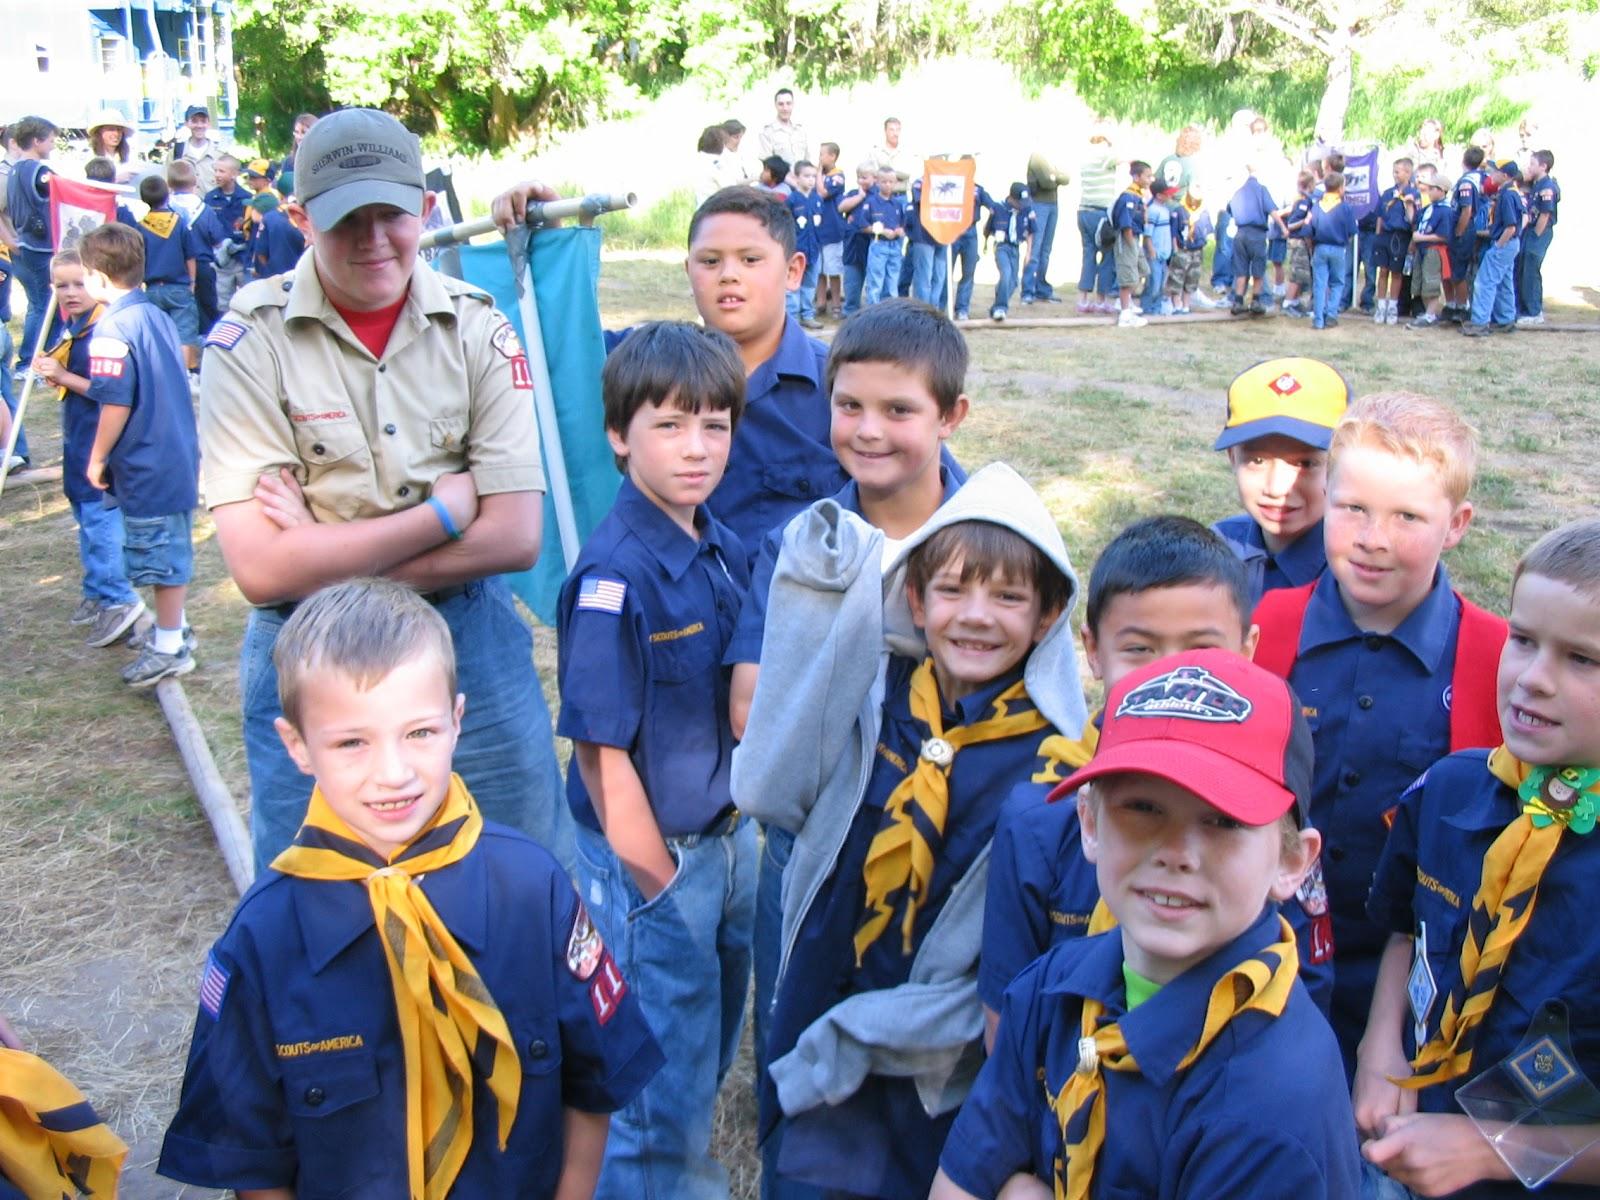 Alpine District Cub Scouts March